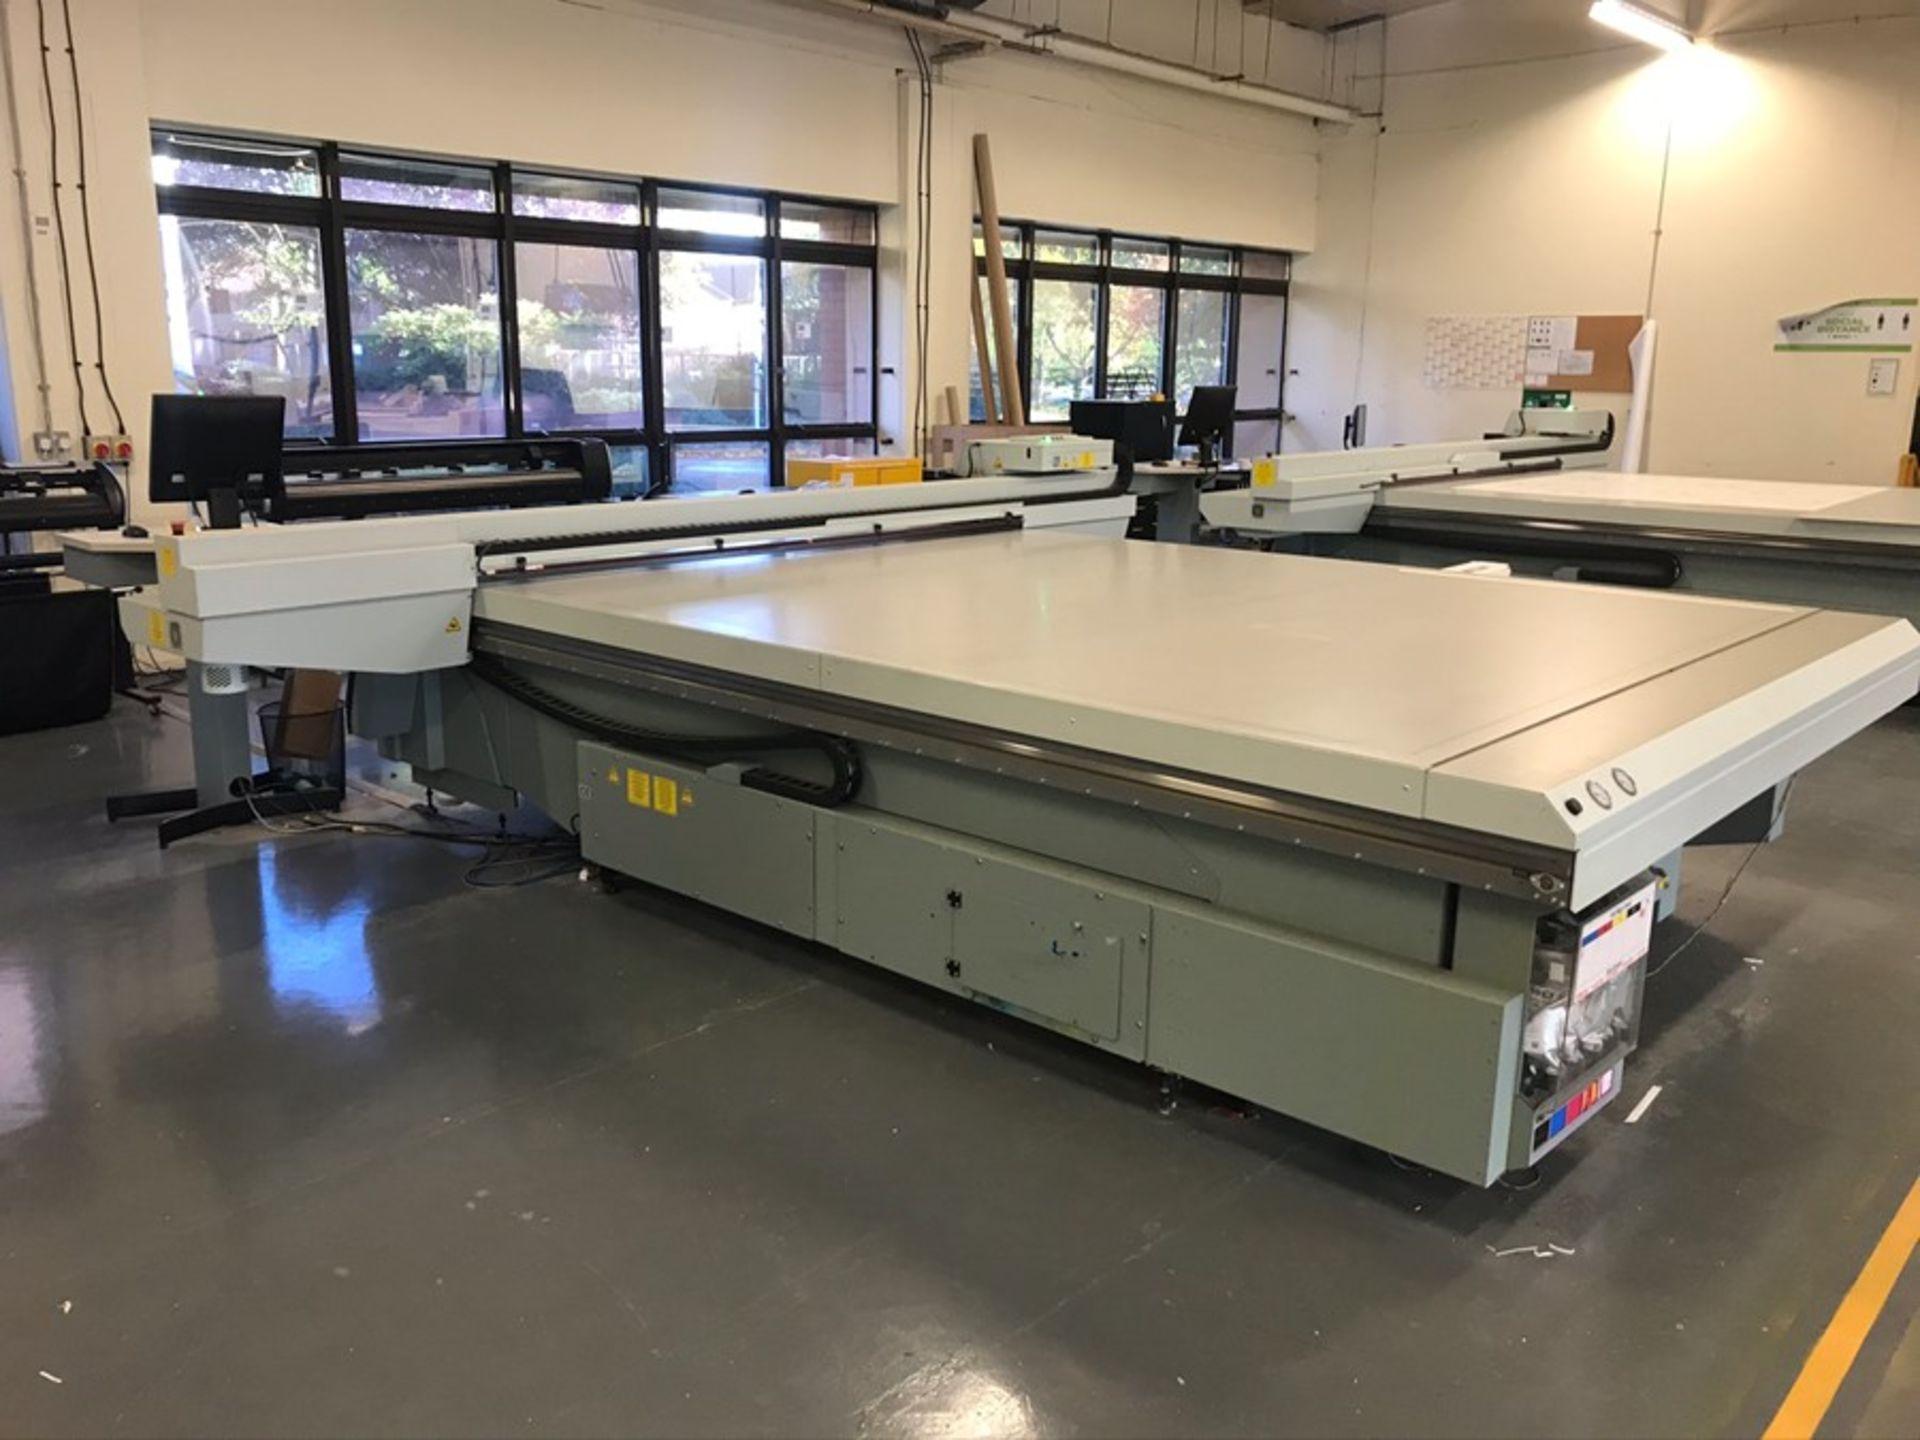 Oce Arizona 550XT + WIO UV flatbed printer (2013) - Image 4 of 22